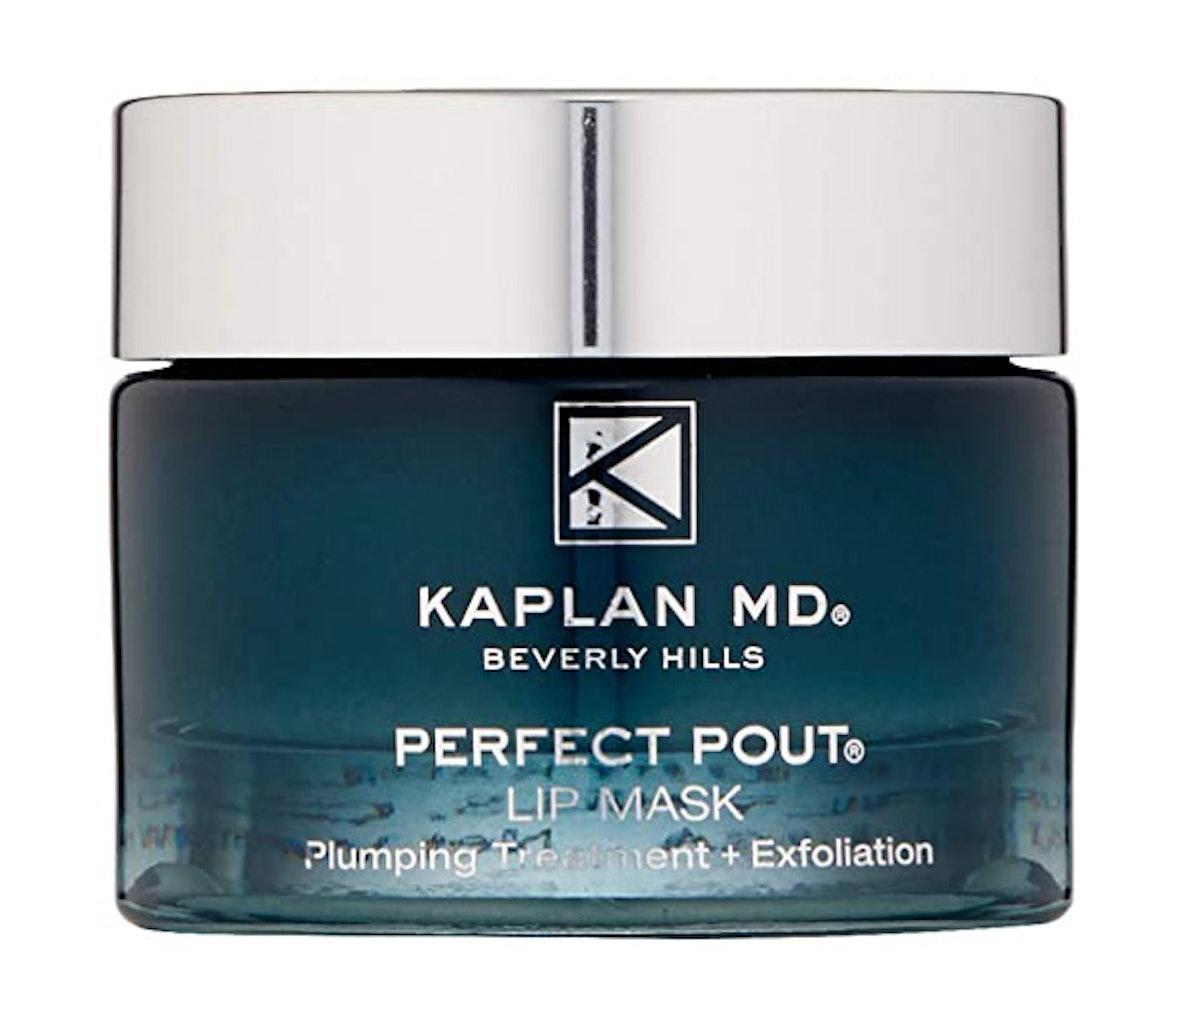 Kaplan MD Perfect Pout Lip Mask Plumping Treatment + Exfoliation